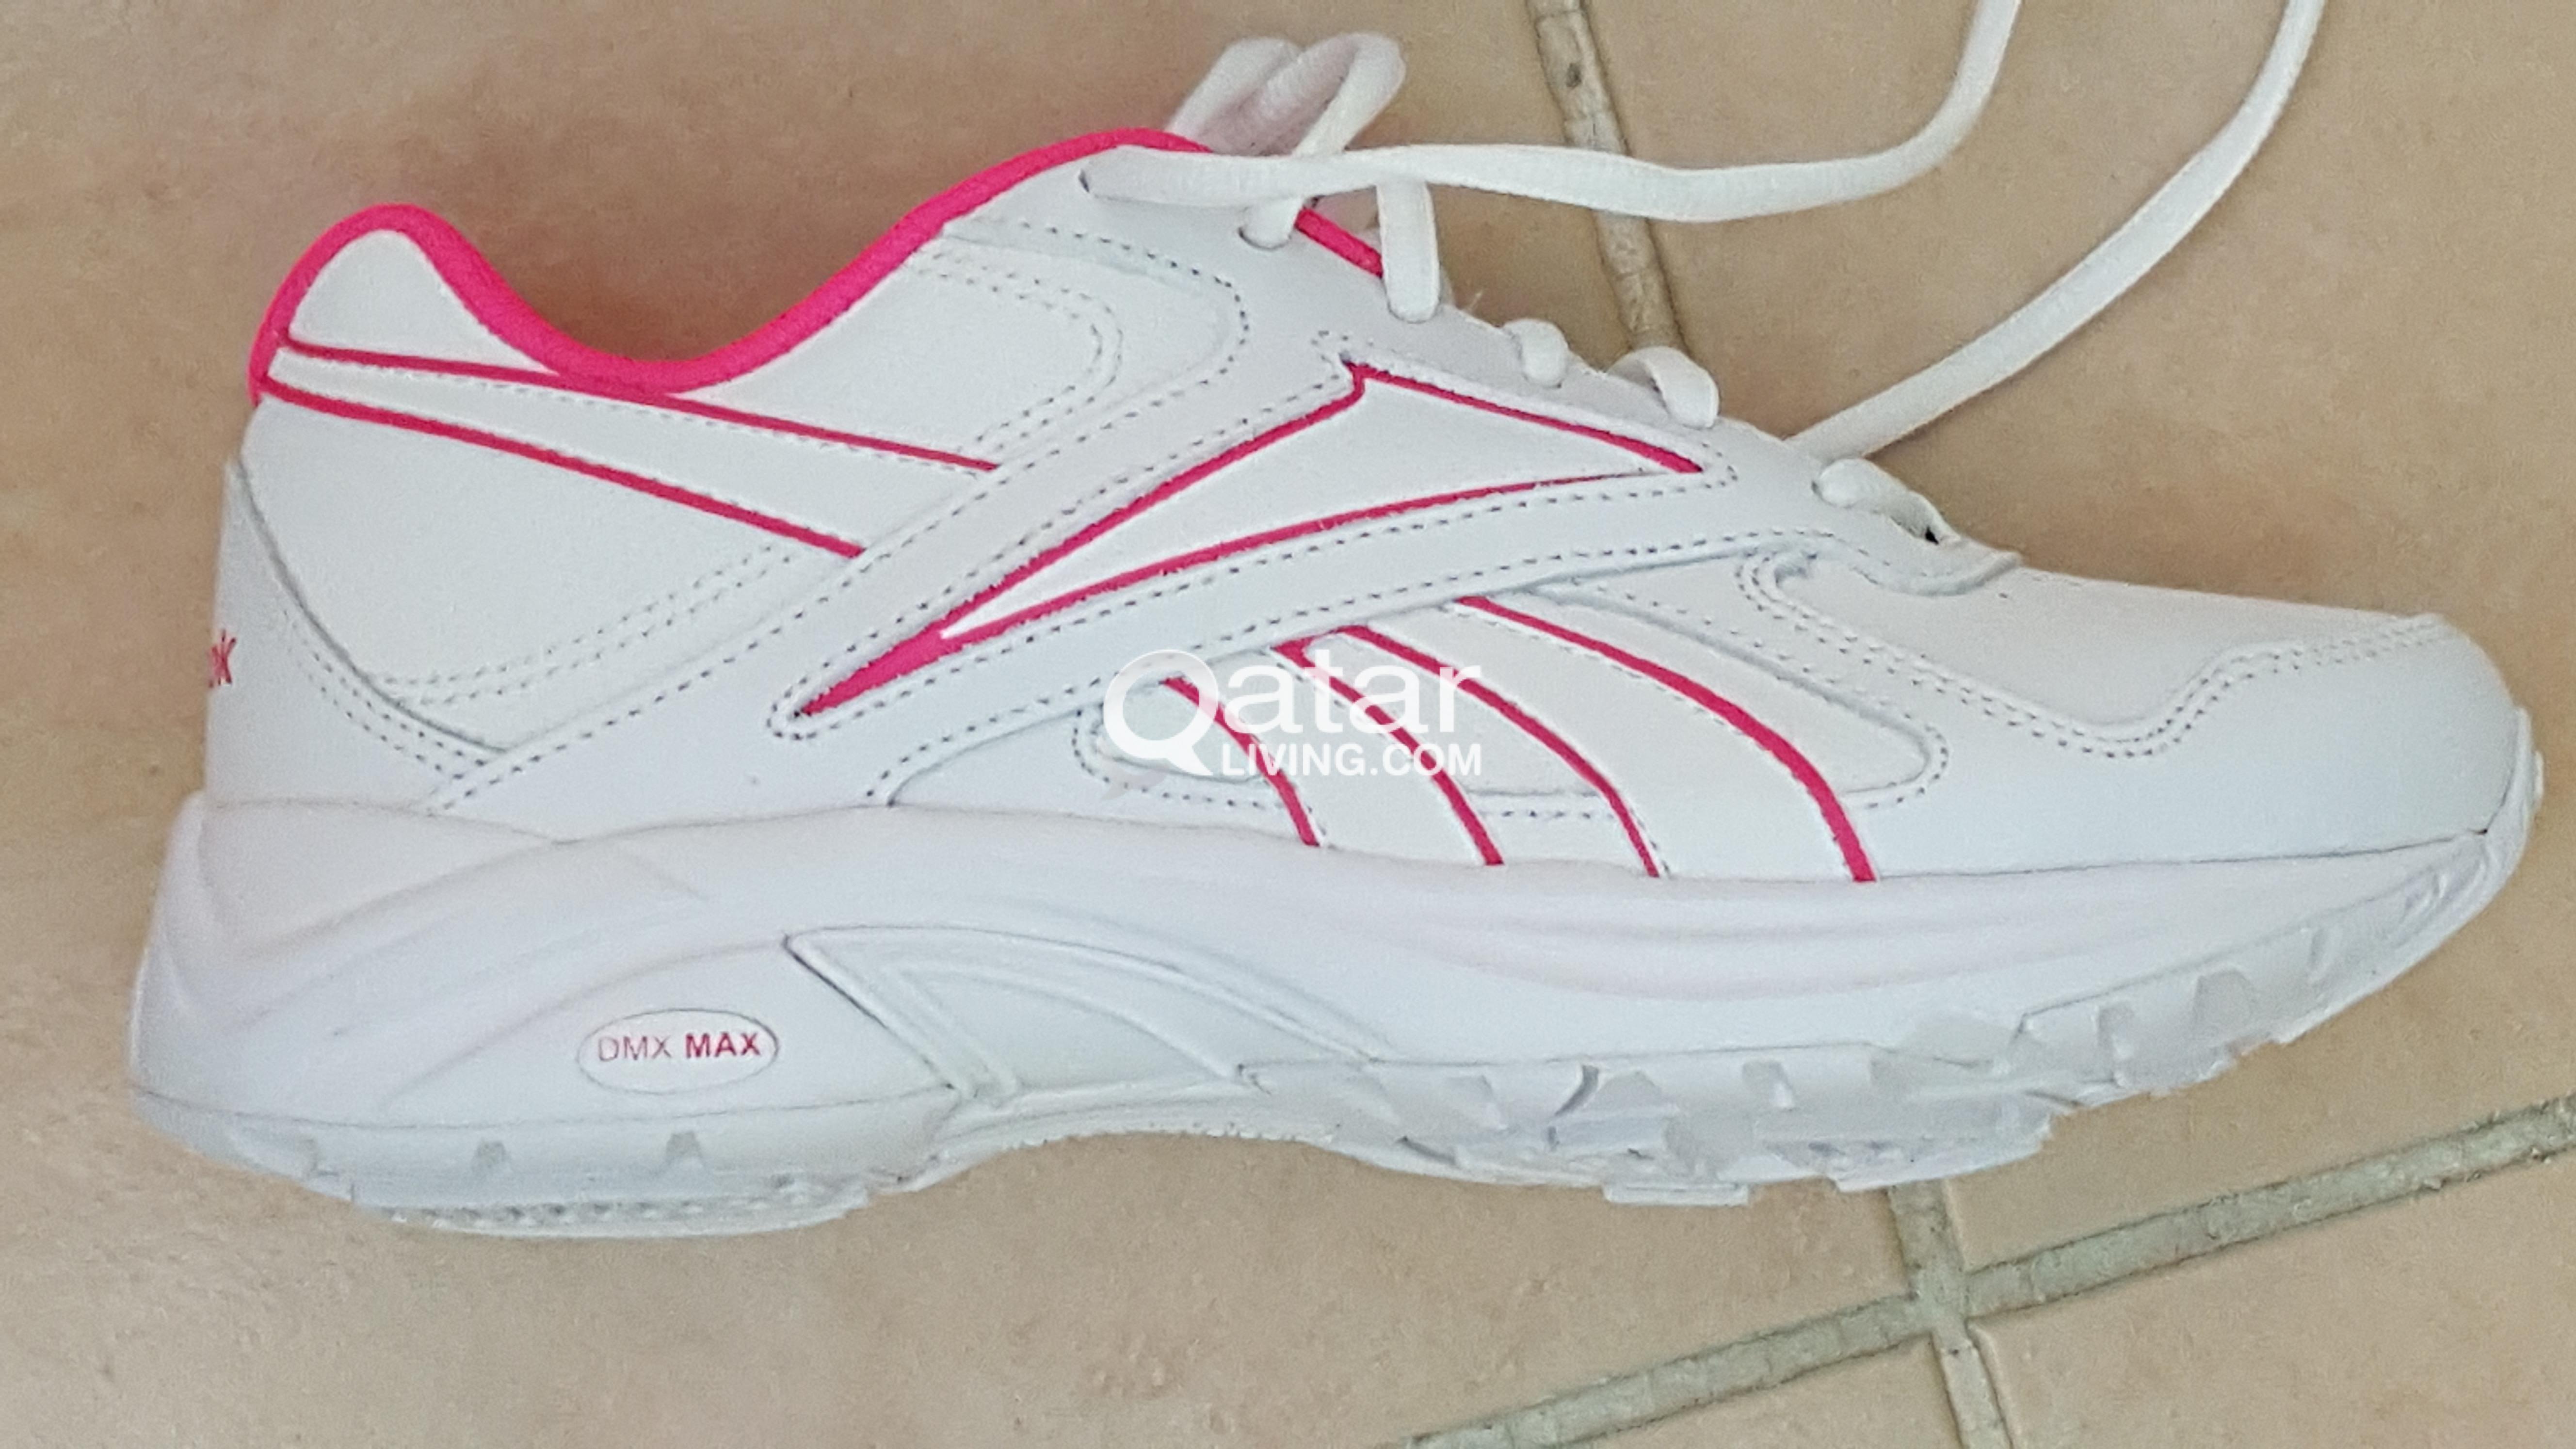 b961e540d09ed Brand New Reebok Womens Ultra V Dmx Max White Walking Shoes Size 5.5 U.S. 36  EUR